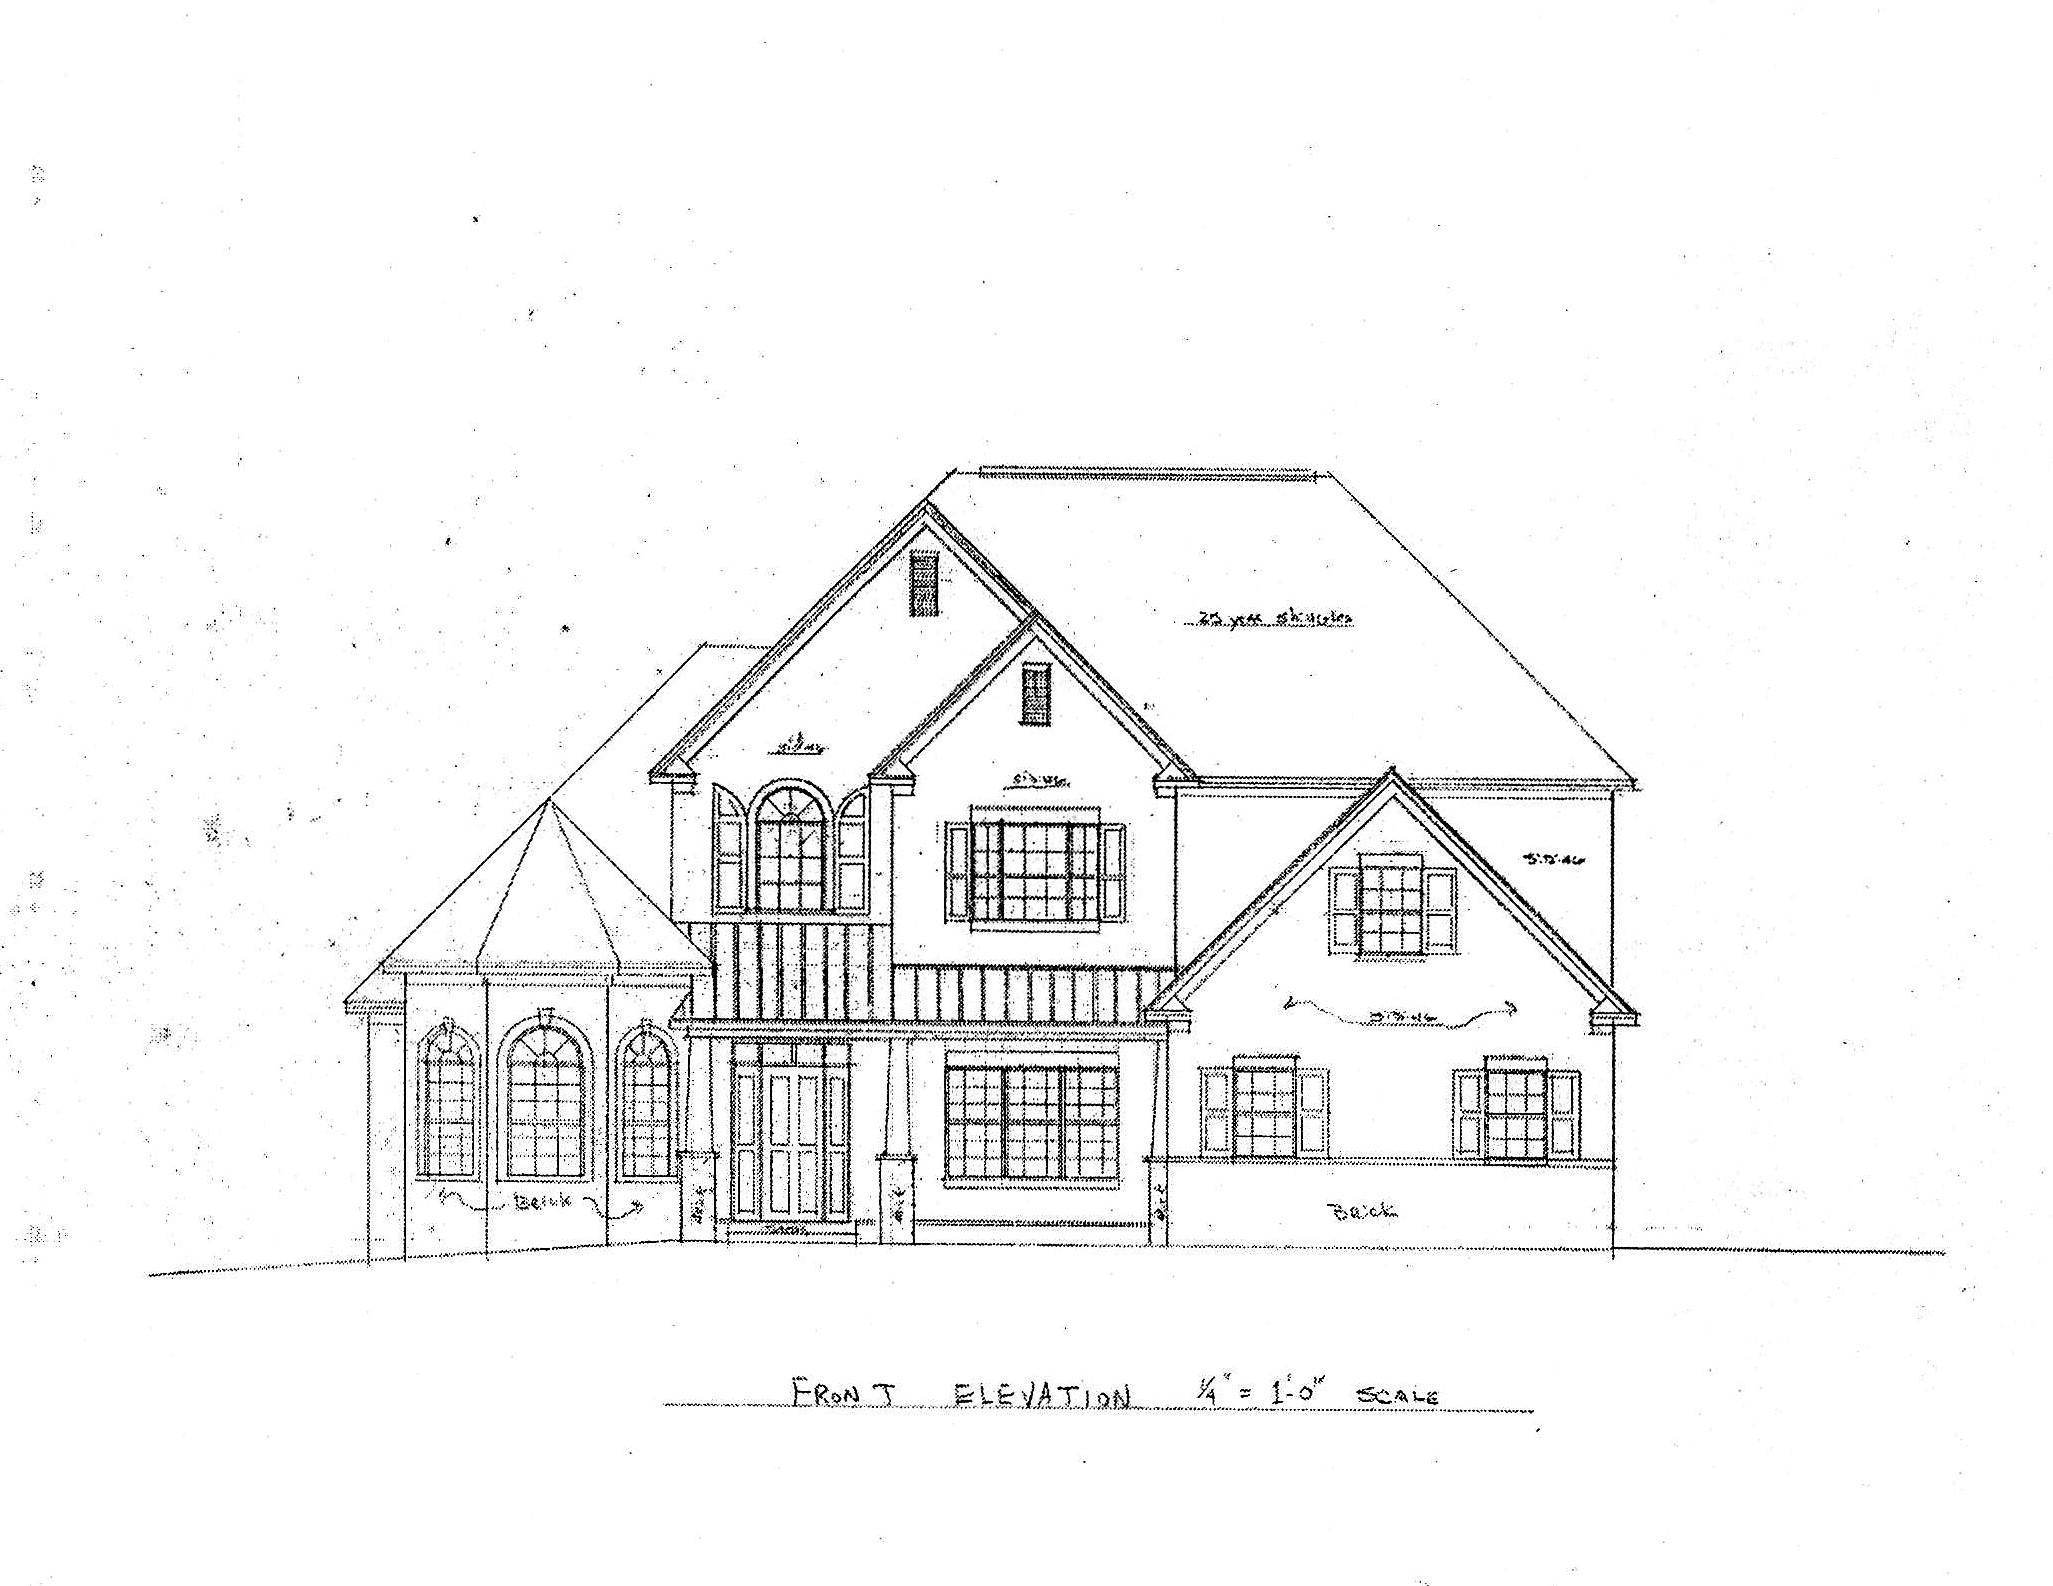 170 Glenmoor Drive, Southern Pines, NC 28387